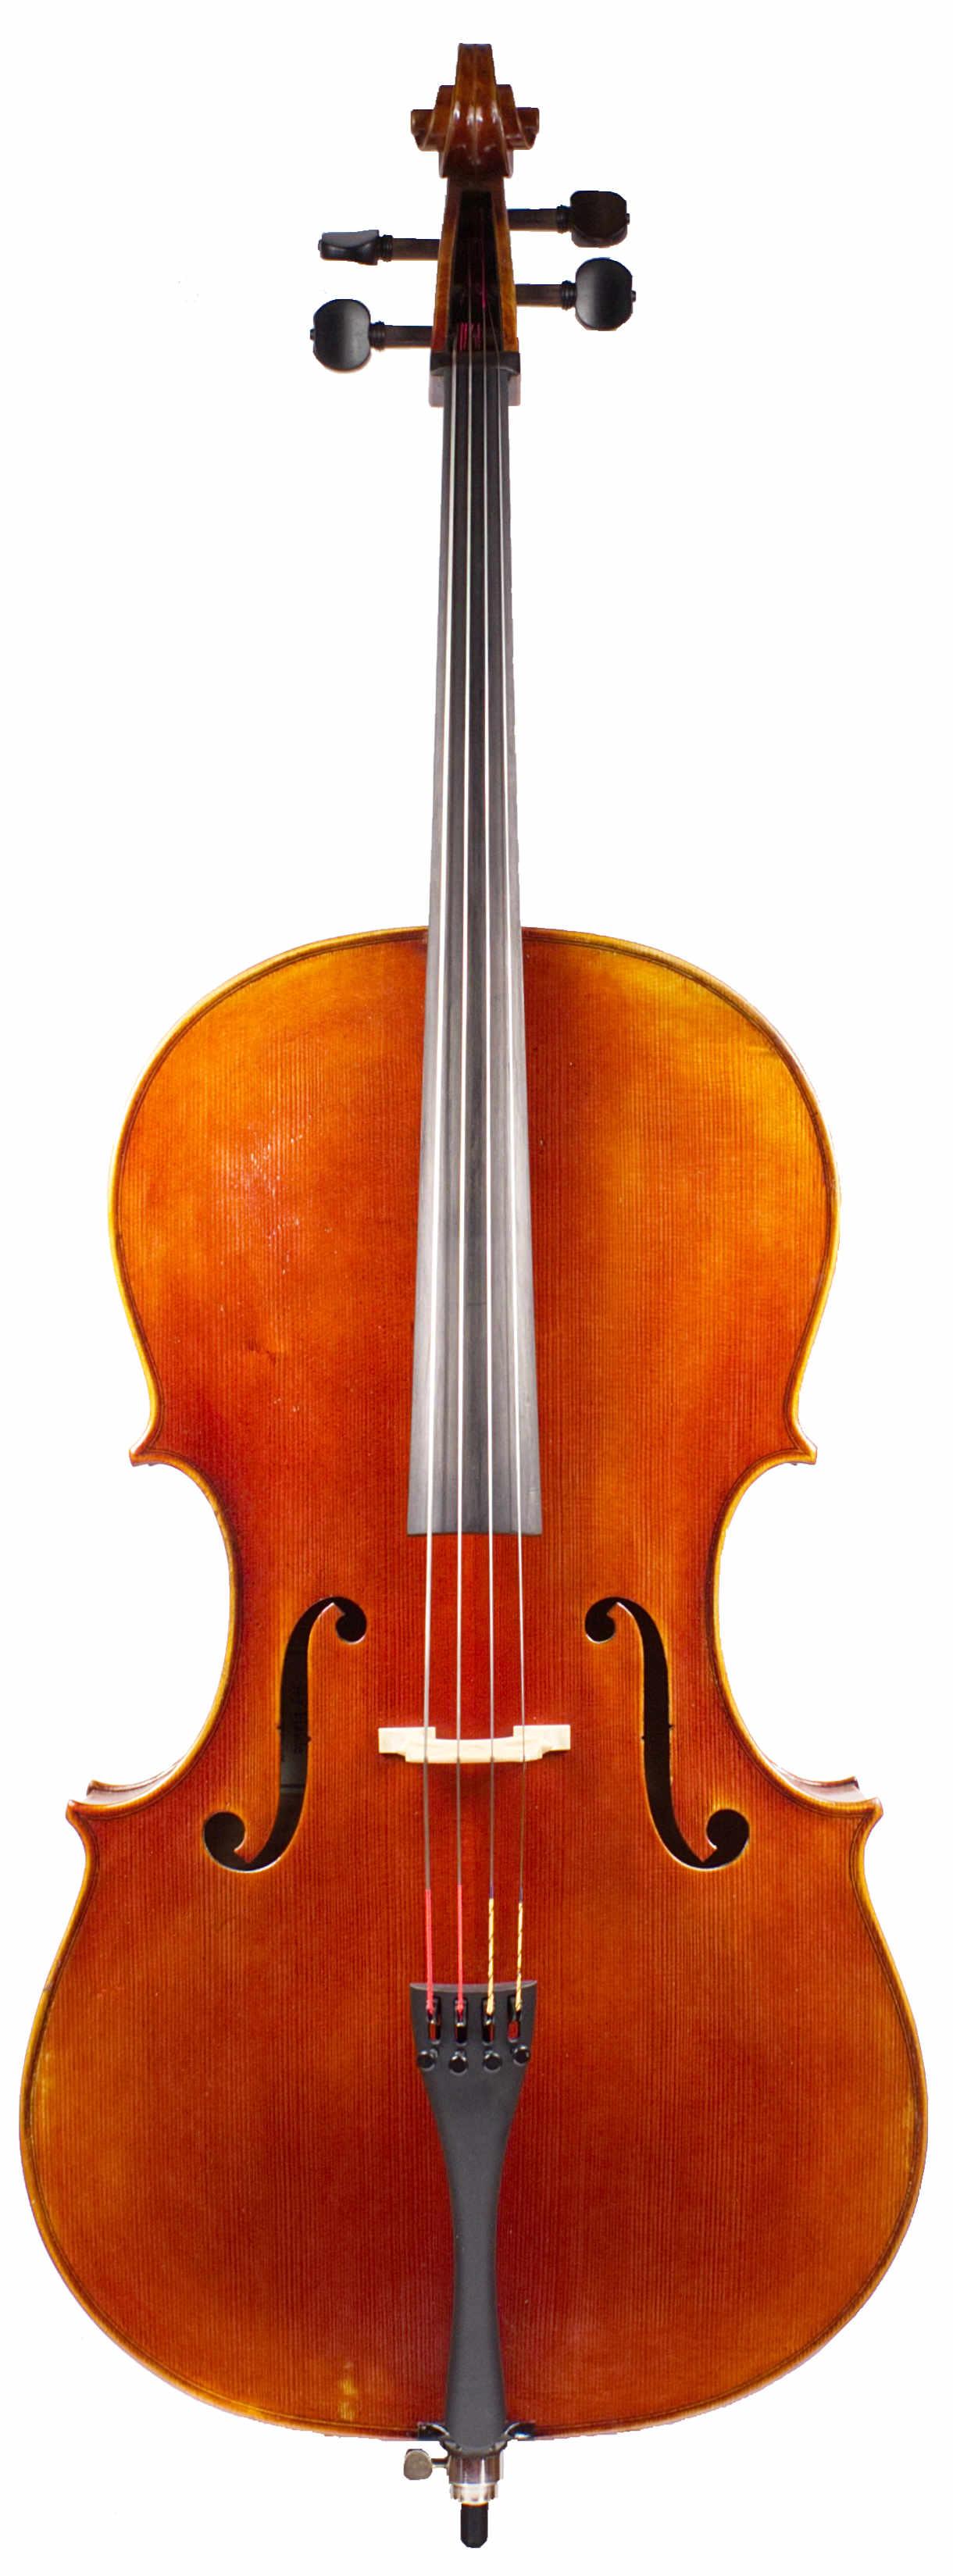 Jay Haide Ruggieri Cello